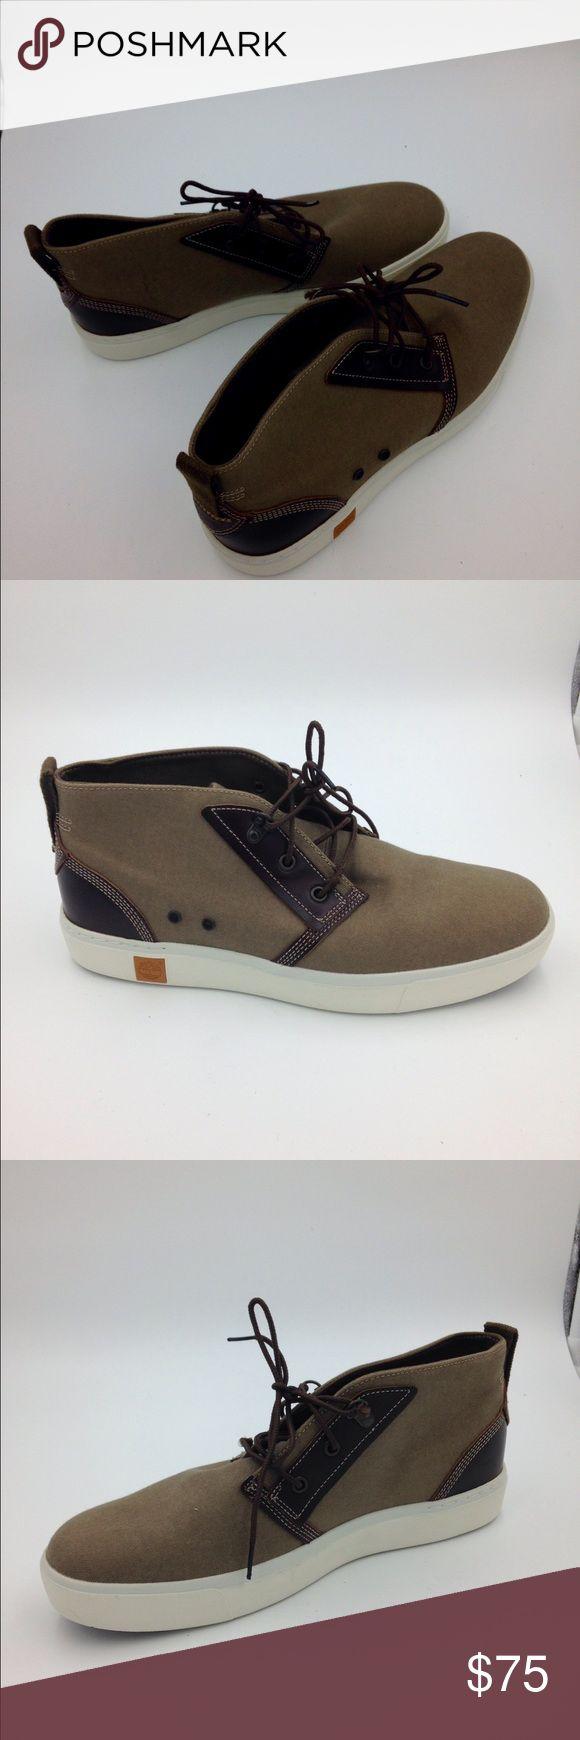 ‼️‼️ New  Men's Timberland Chukka Boots Chukka boots, never worn. B4                                               ‼️‼️‼️PRICE IS FIRM‼️‼️‼️ Timberland Shoes Chukka Boots